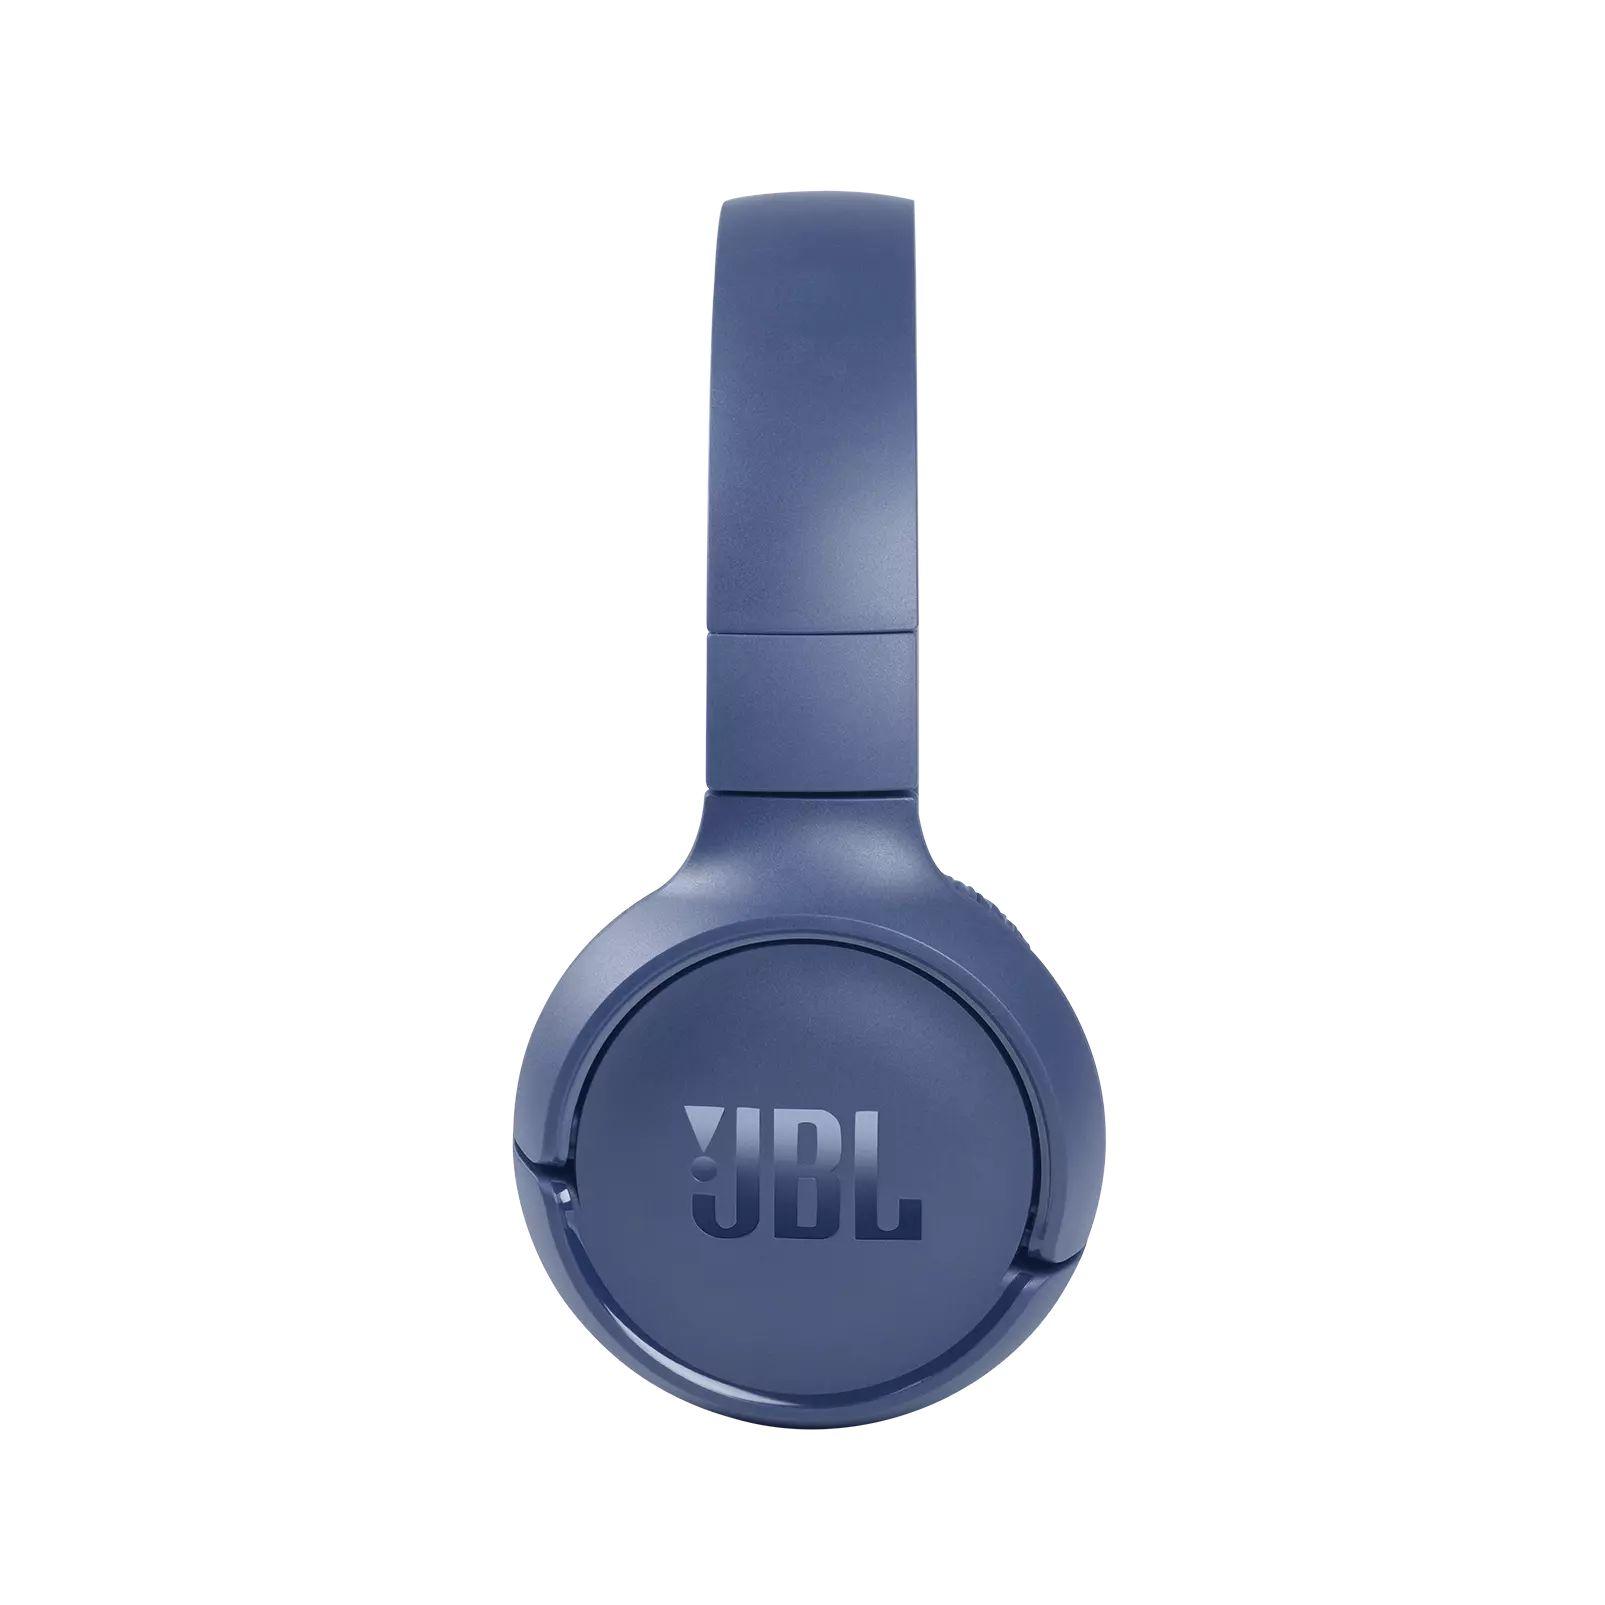 Fone de Ouvido Bluetooth JBL Tune 510BT - Azul JBLT510BTBLU